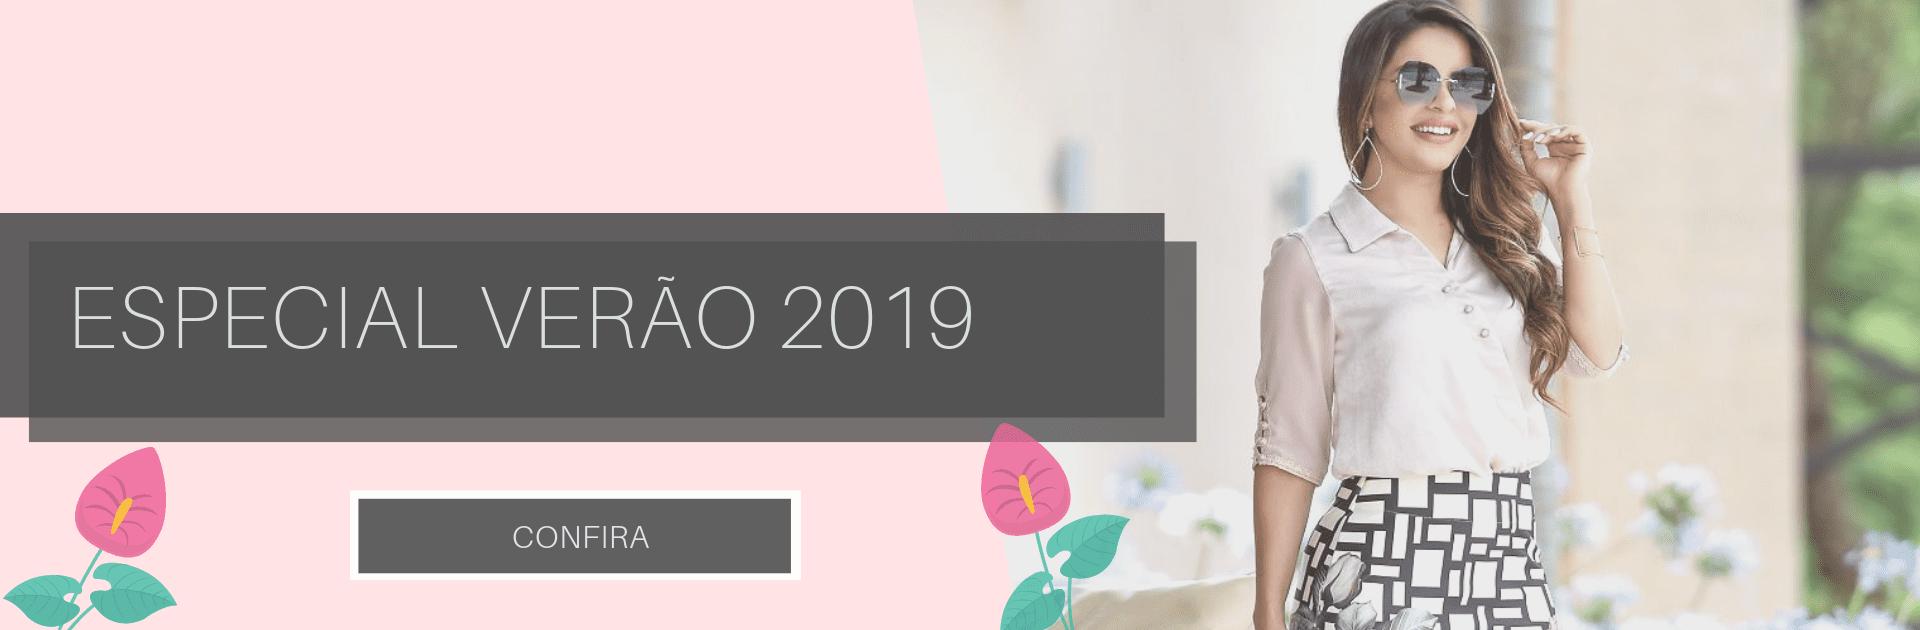 Moda evangelica verao 2019 by Sophi